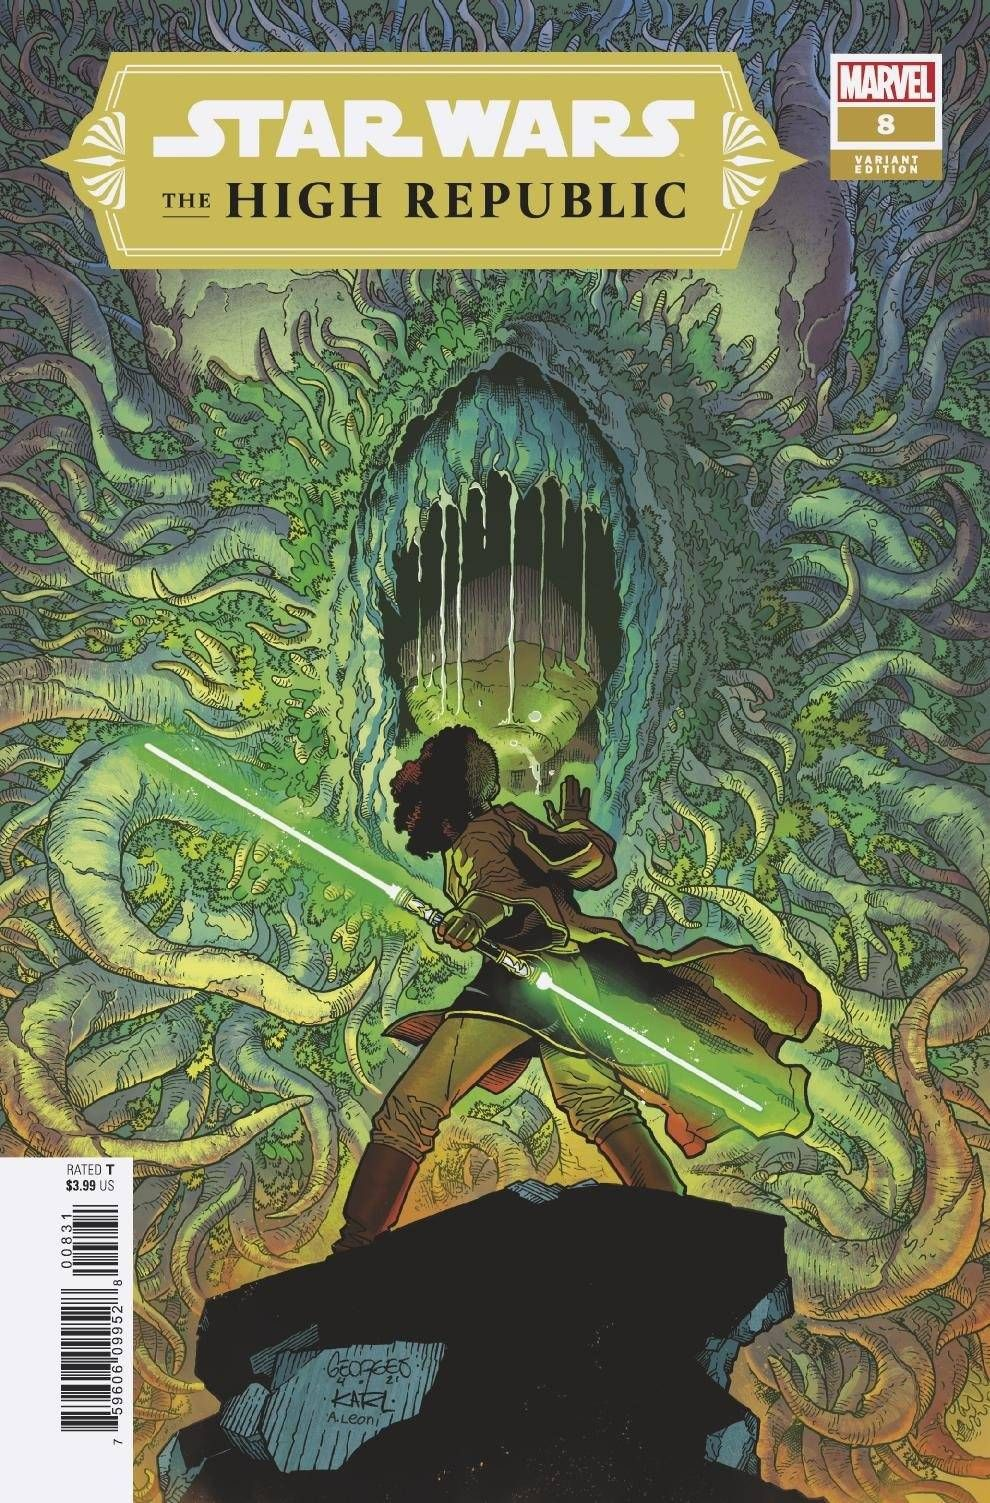 eyJidWNrZXQiOiJnb2NvbGxlY3QuaW1hZ2VzLnB1YiIsImtleSI6ImM5NjYxYmMyLTA2MGItNGQxNS1hOTcxLThlZjkxMGZhYmJiNC5qcGciLCJlZGl0cyI6W119 ComicList: Marvel Comics New Releases for 08/11/2021